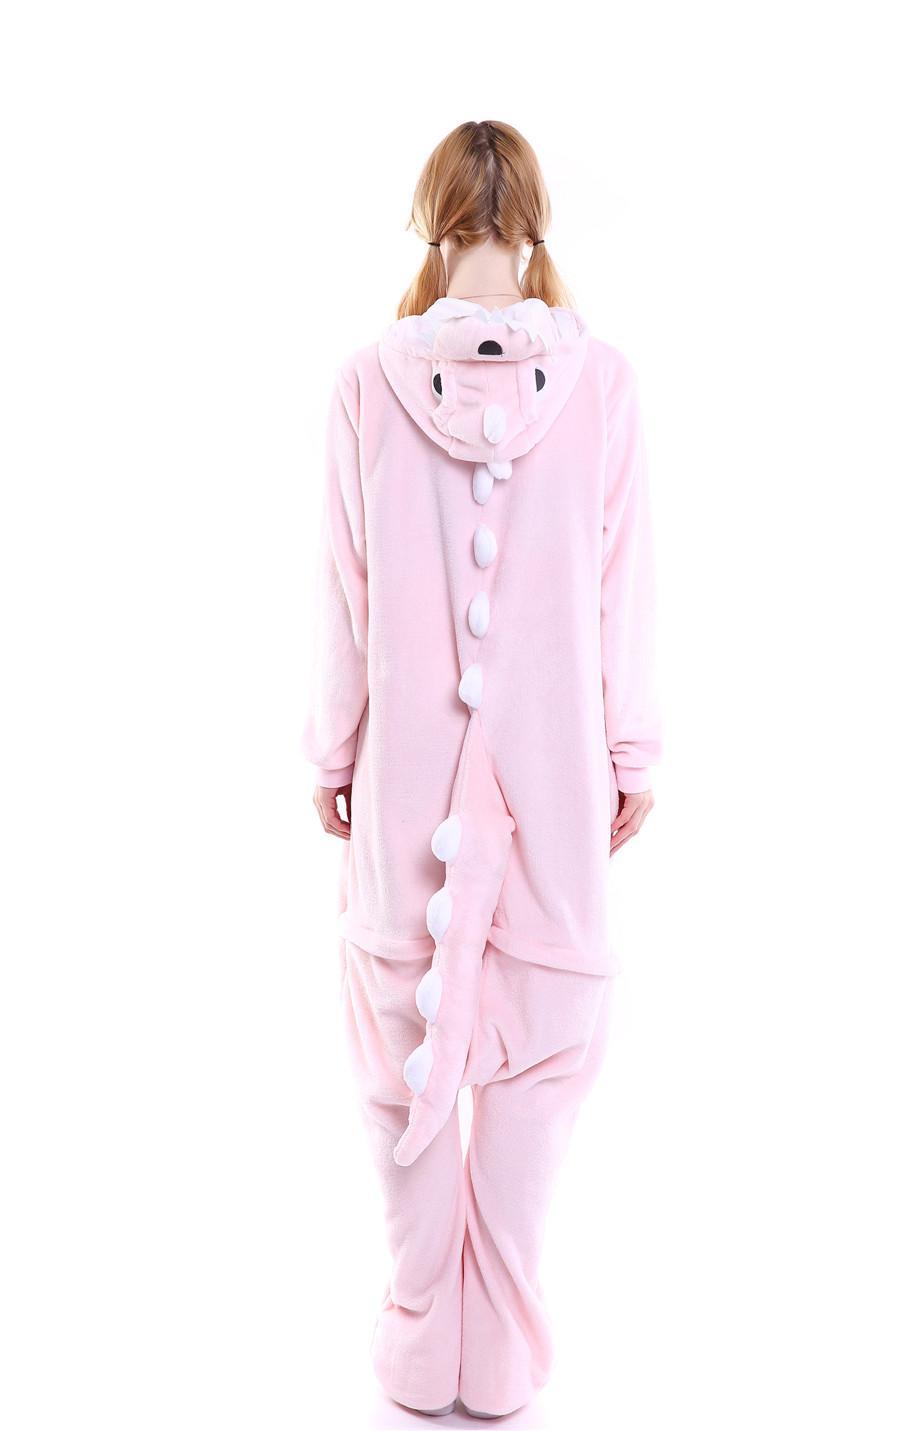 cf5124fc9d50 Animal Onesie Pajamas For Women Cute Winter Autumn Spring Teen Juniors  Anime Cosplay Homewear Fashion One Piece Pyjama Ladies Nightgown Costumes  For 6 ...